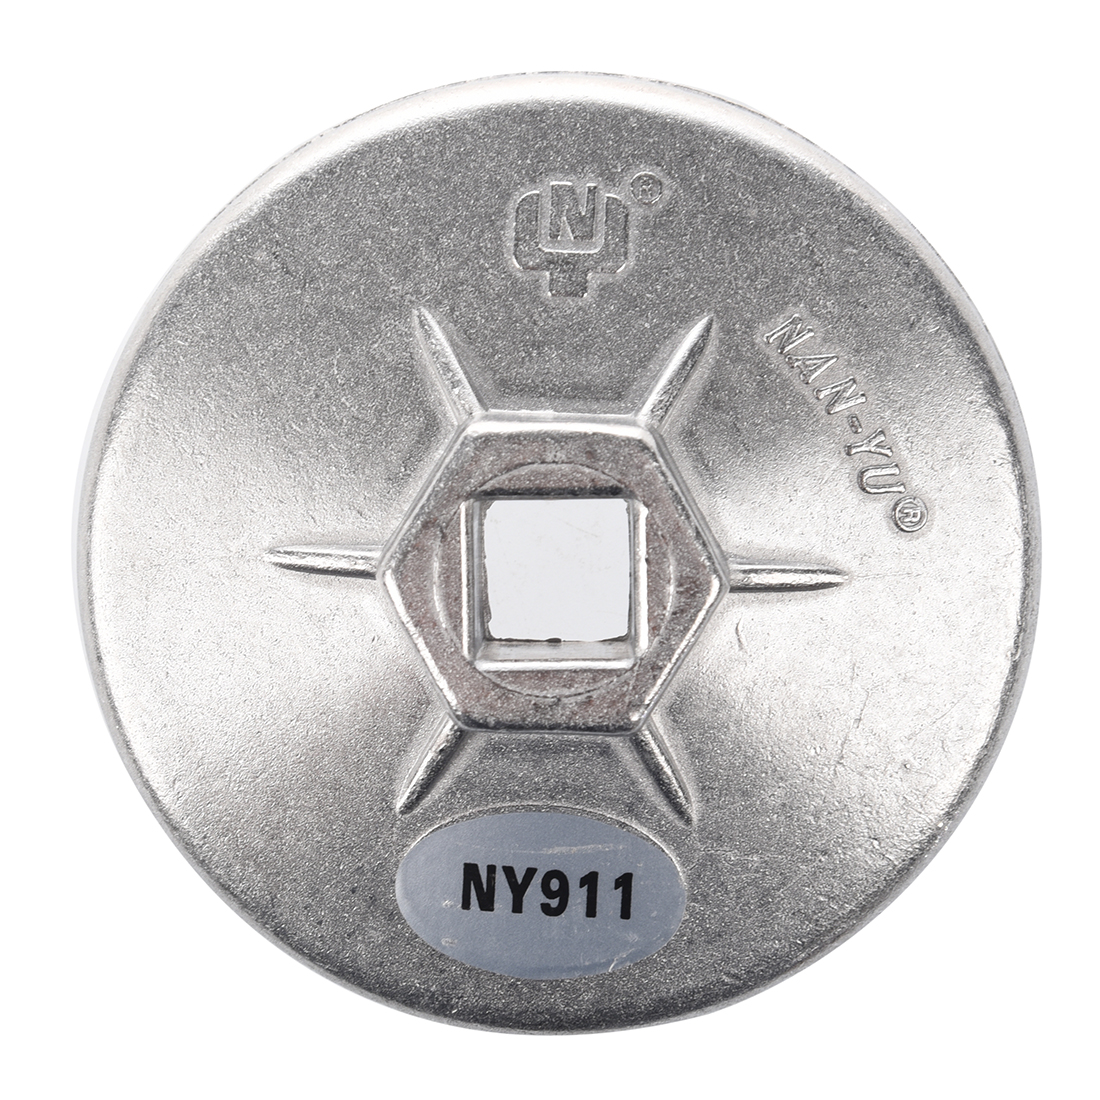 Both Sides Protrude Inside Diameter 76mm 12 Flutes Oil Filter Cartridge Cap Wrench Tool Socket Remover